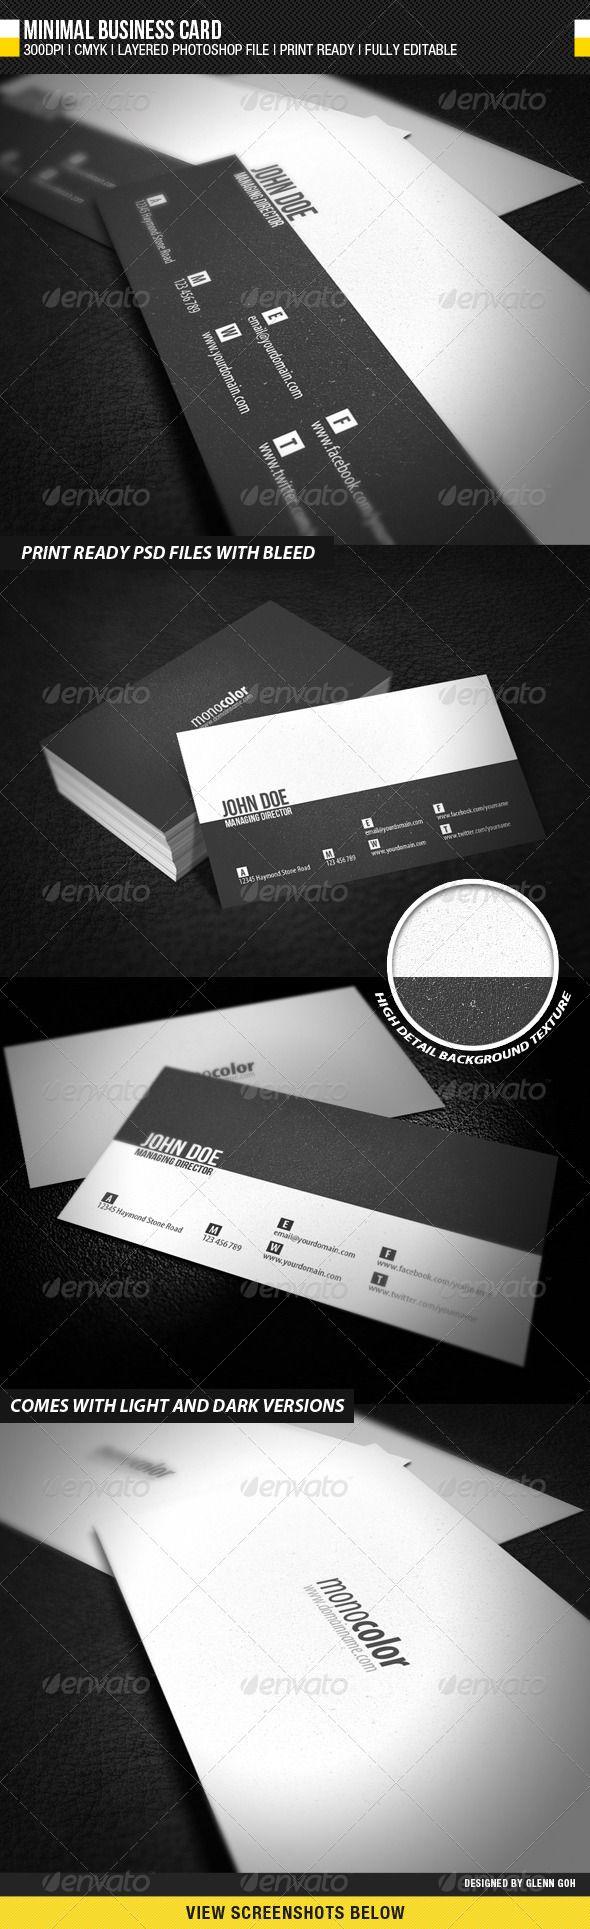 minimal business card minimal business business card